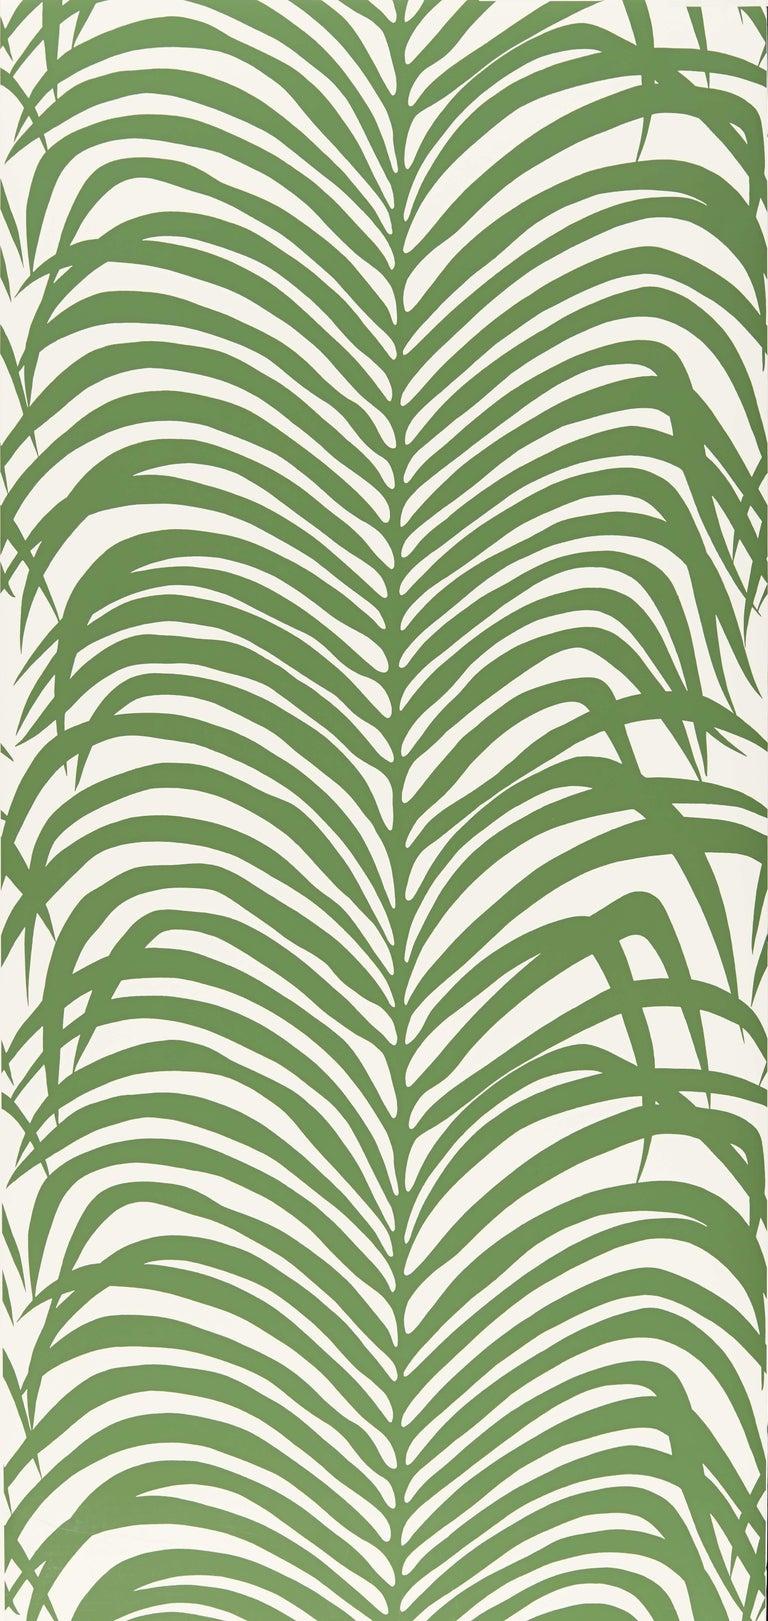 Bohemian Schumacher Zebra Palm Wallpaper in Jungle For Sale